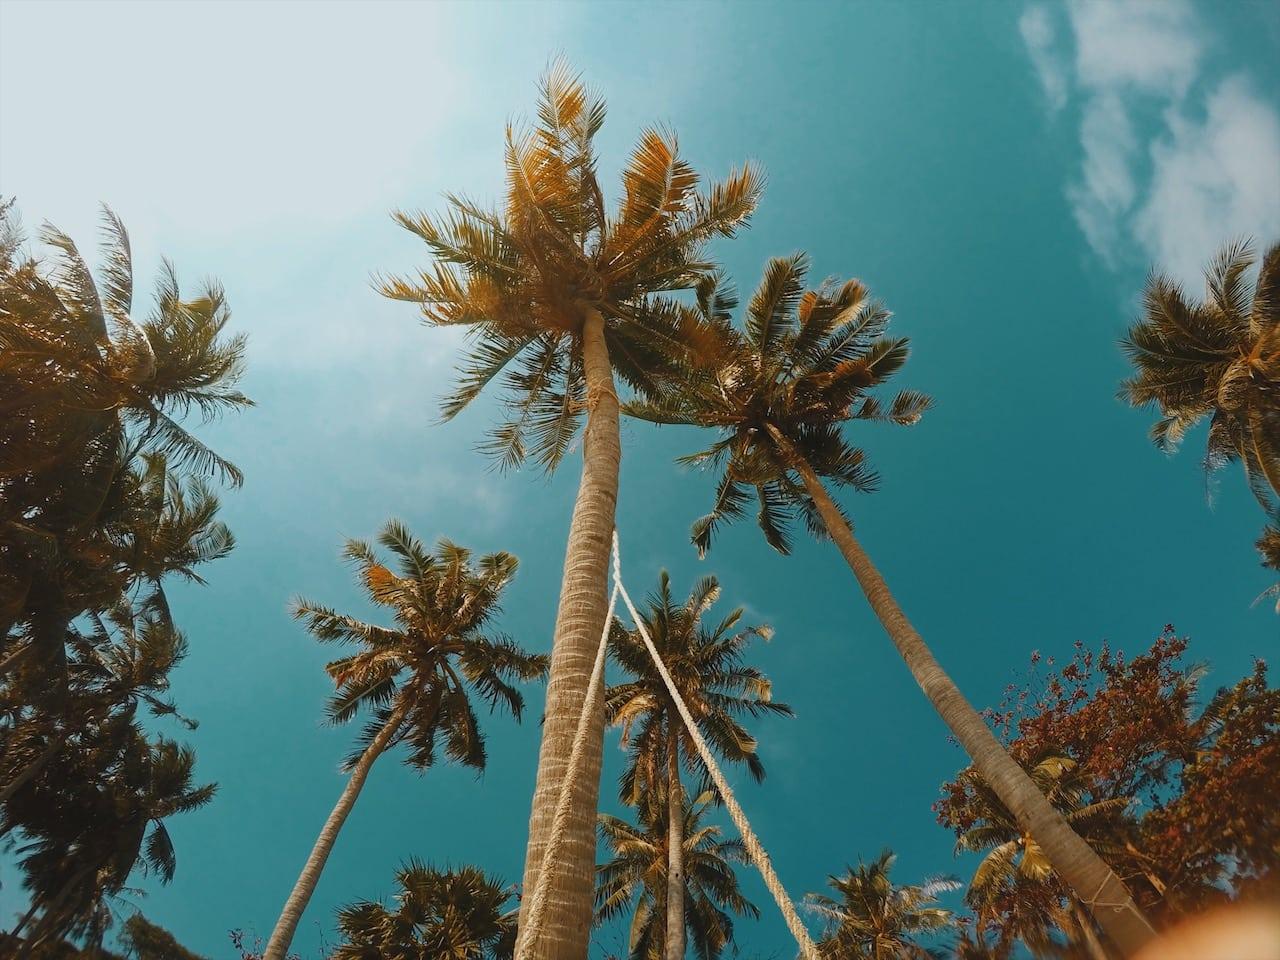 palmy sao beach wyspa phu quoc wietnam neverendingtravel.pl